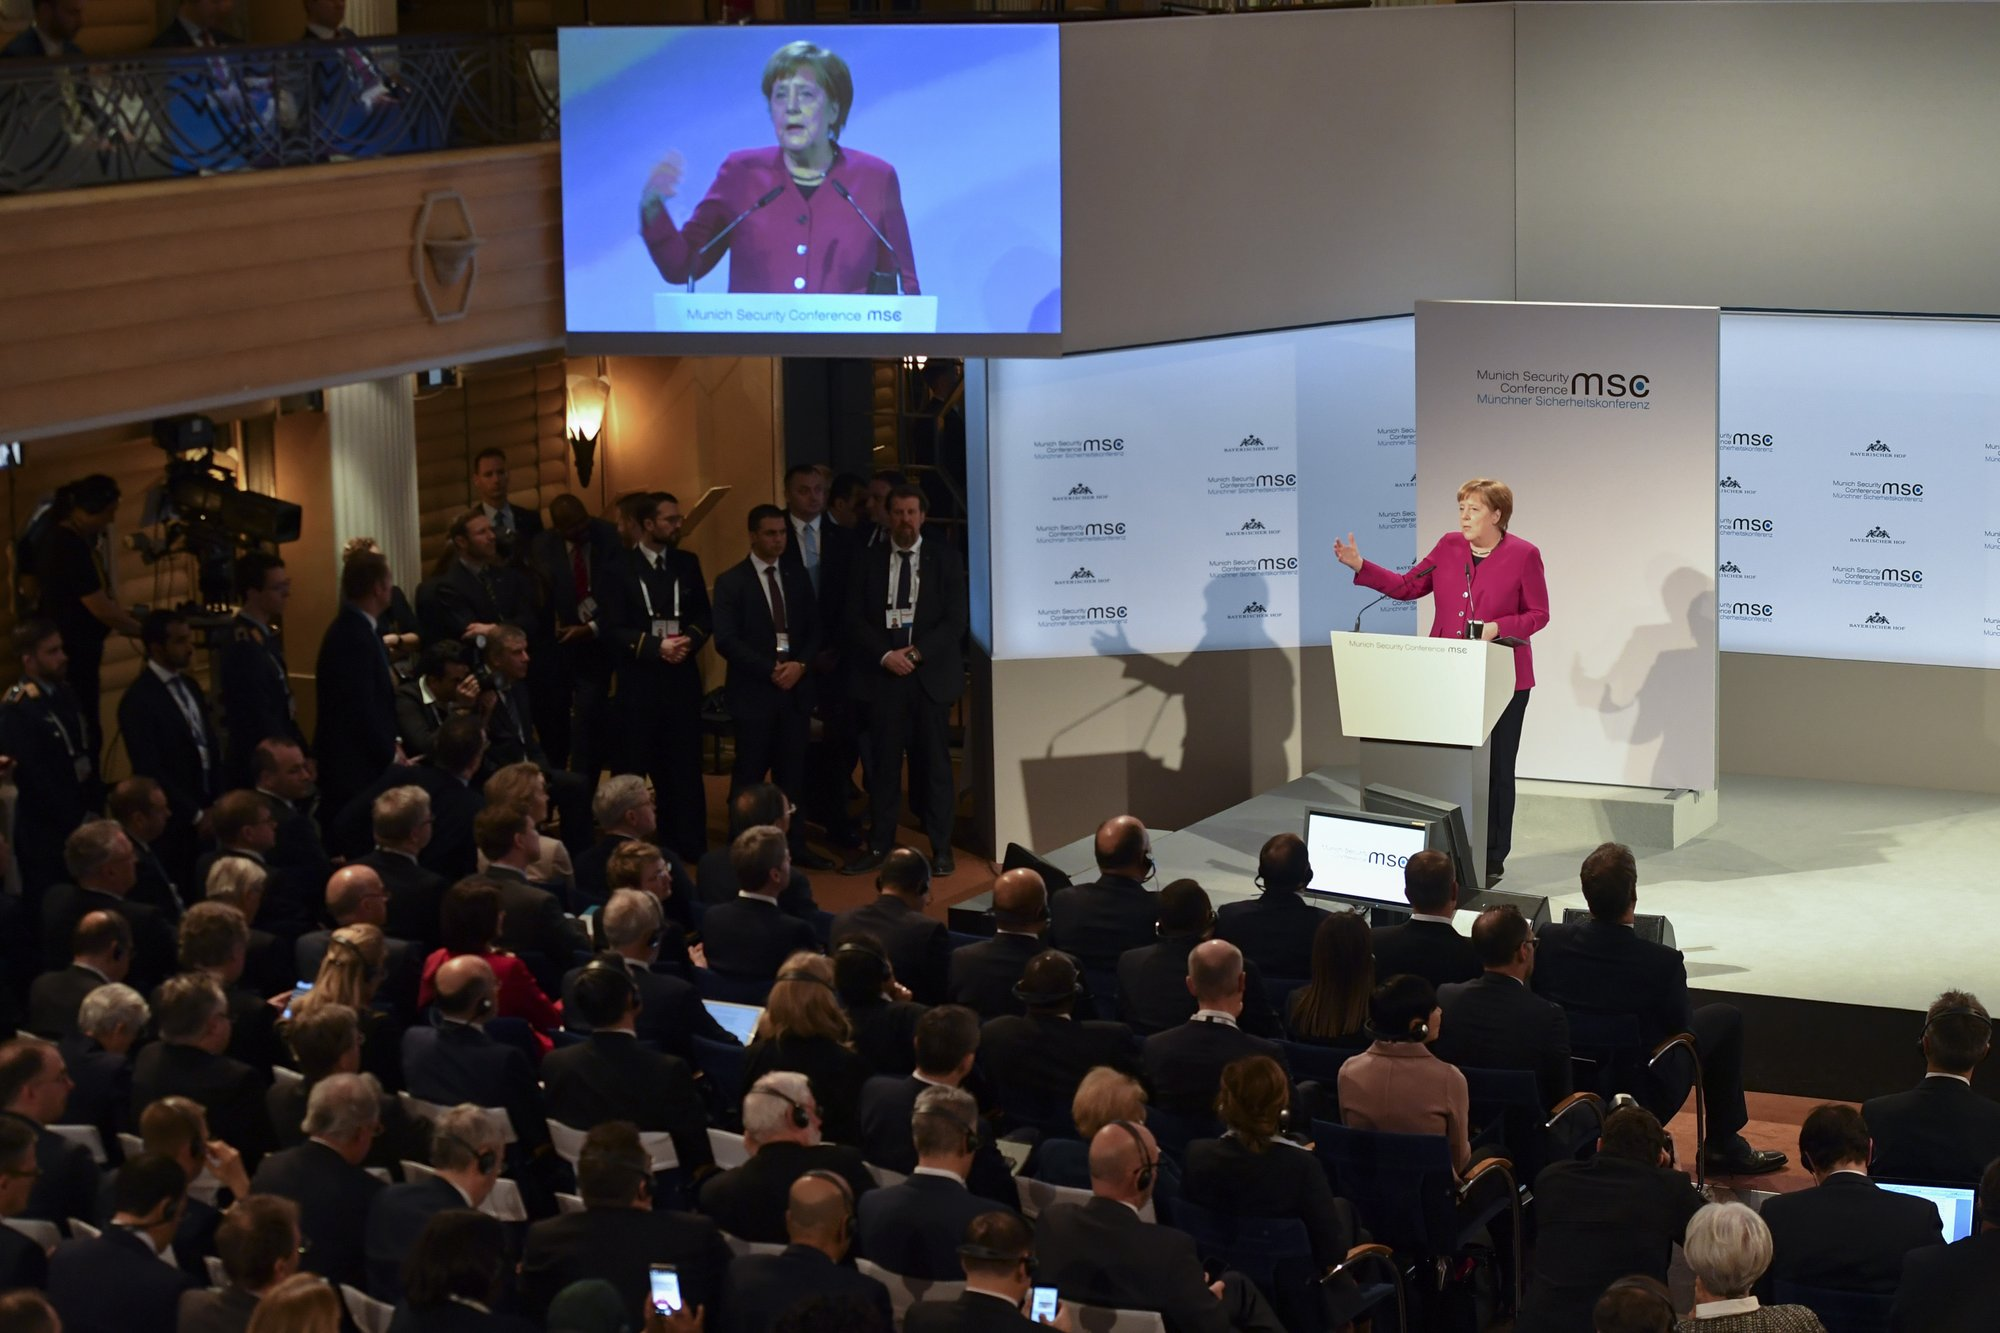 Merkel defends Iran deal, multilateralism but Pence resists